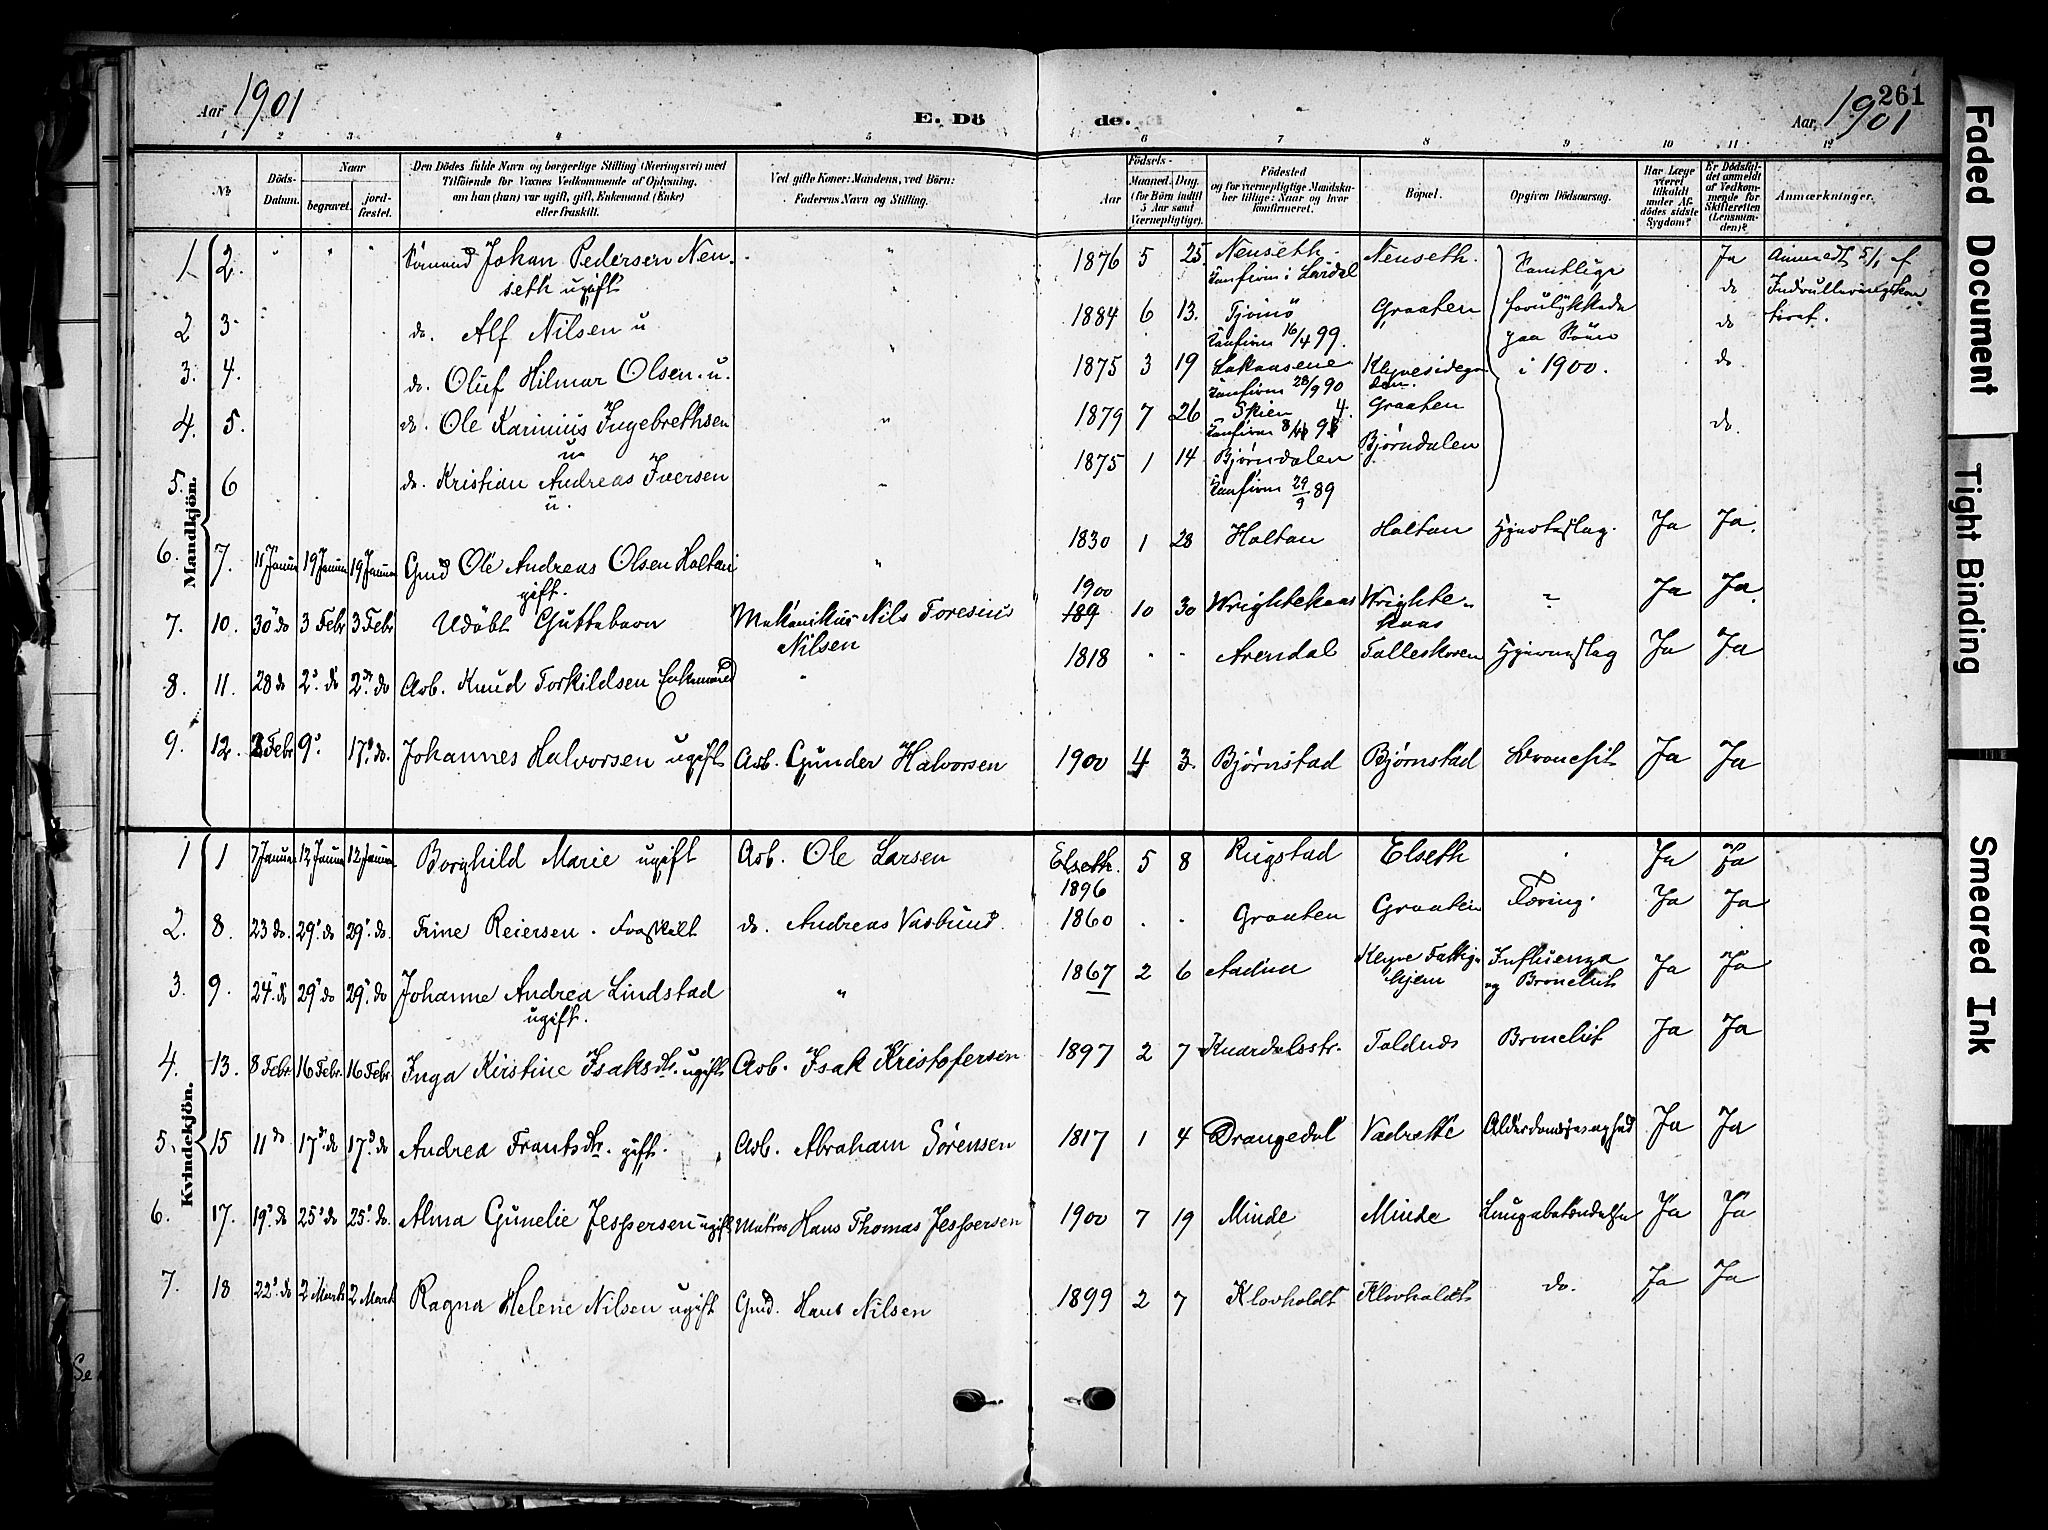 SAKO, Solum kirkebøker, F/Fa/L0011: Ministerialbok nr. I 11, 1898-1909, s. 261